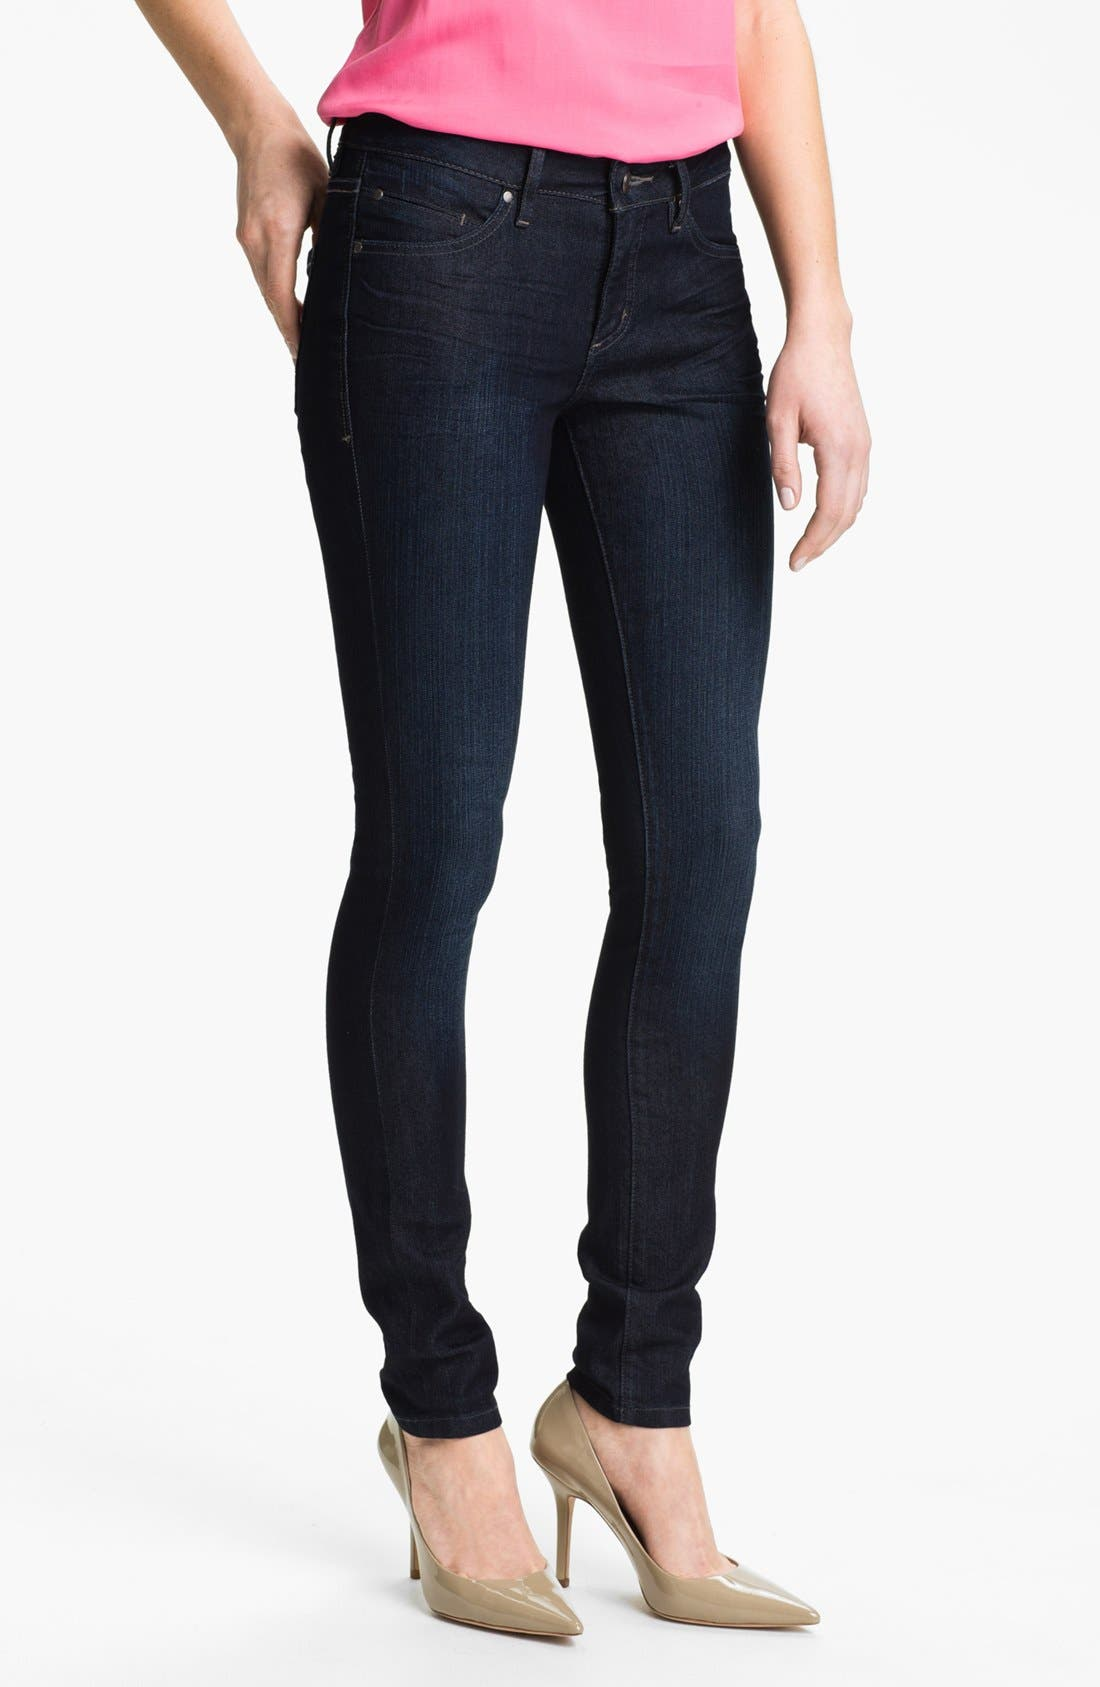 Alternate Image 1 Selected - Jag Jeans 'Reece' Skinny Jeans